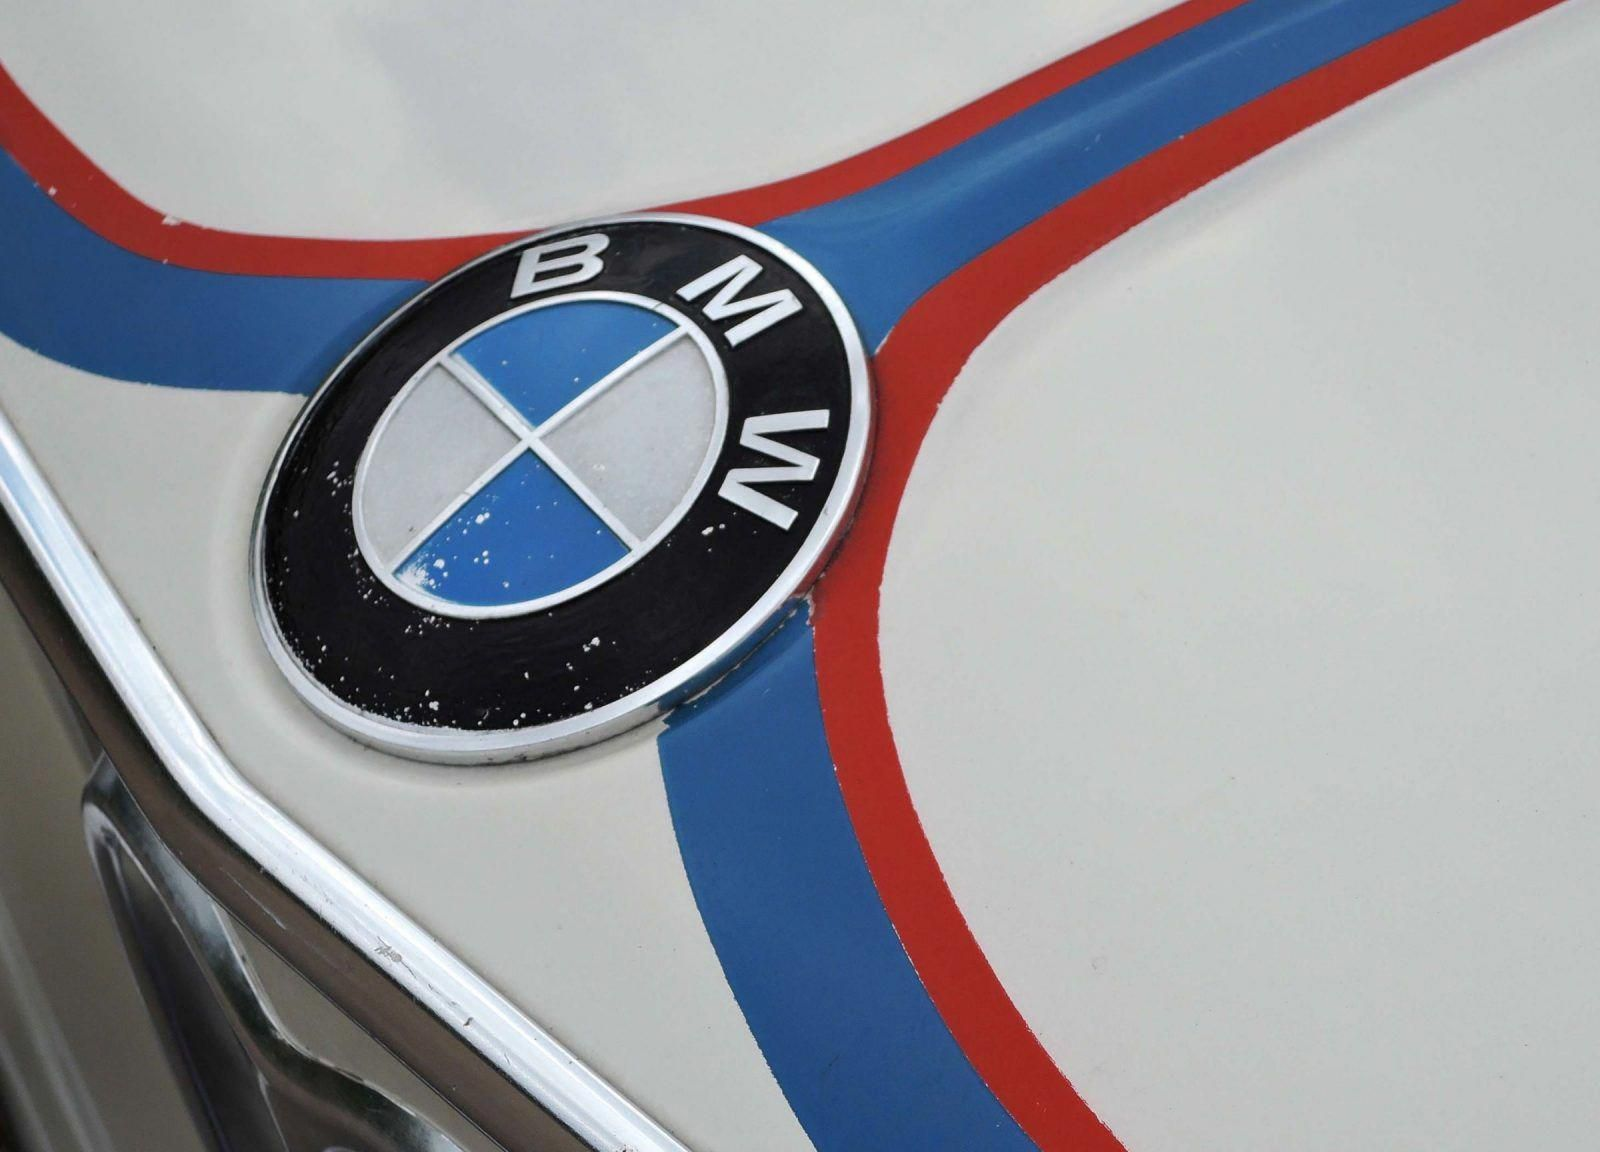 BMW 2002 Tii Badge BMWclassiccars Bmw 2002 tii, Bmw